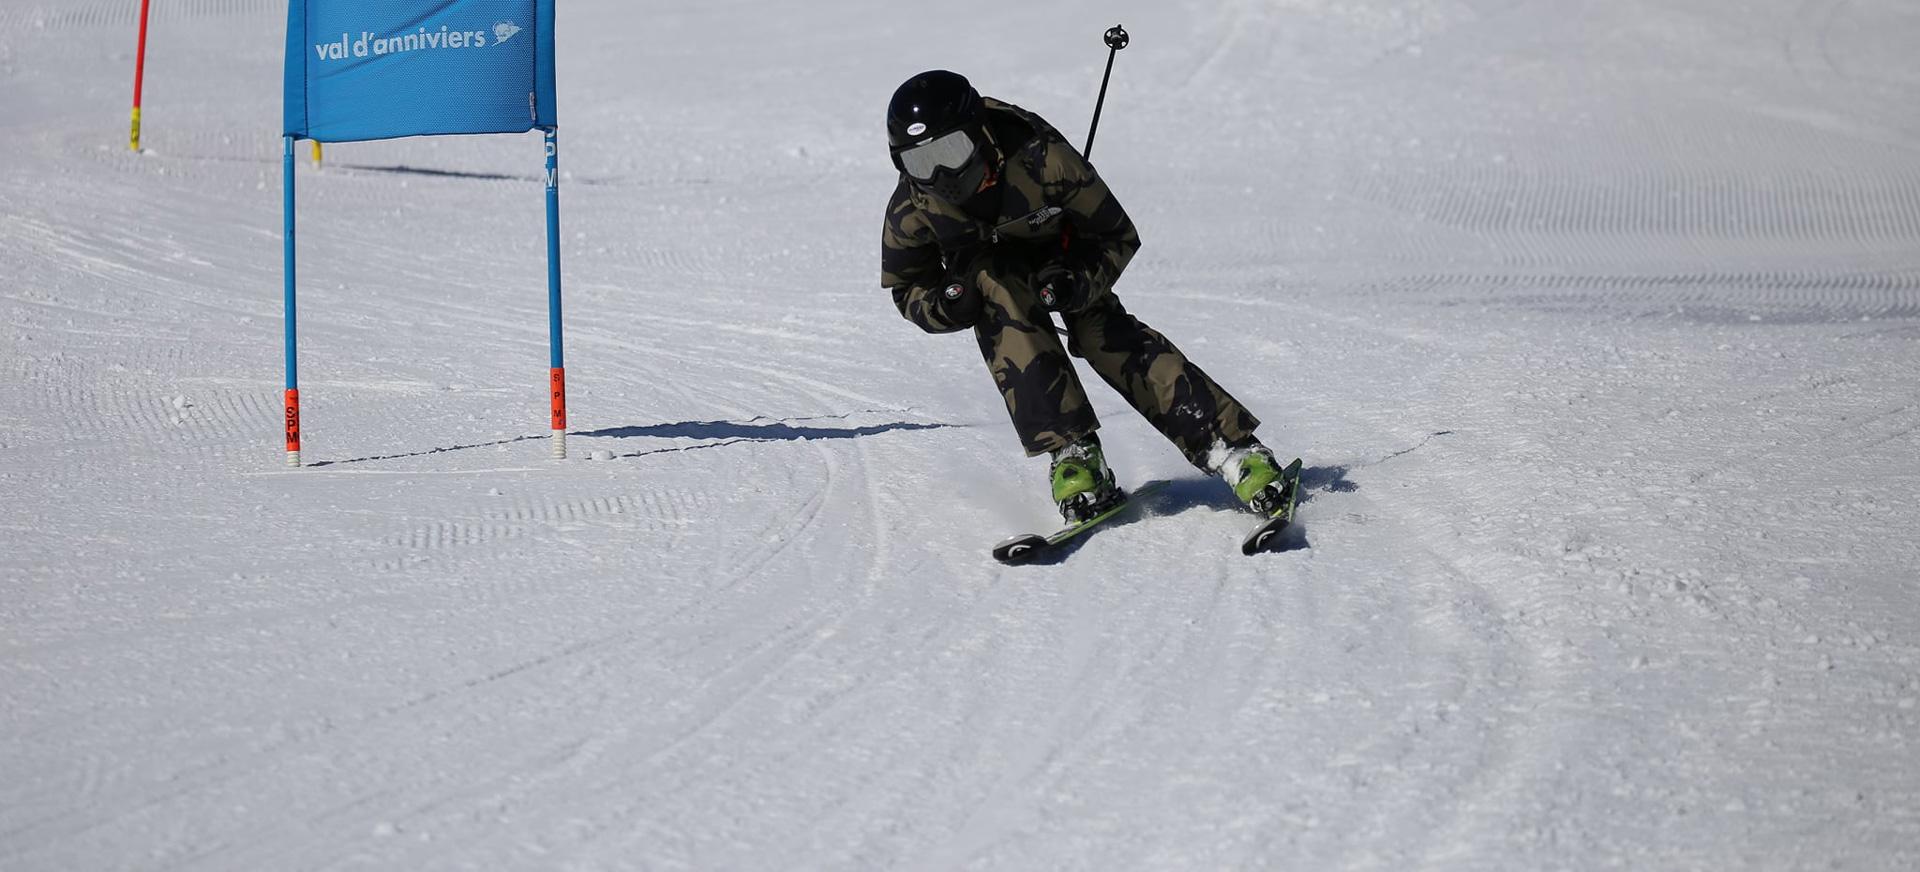 Brillantmont-International-School-Ski-week-and-winter-camp-in-Switzerland---on-the-slopes